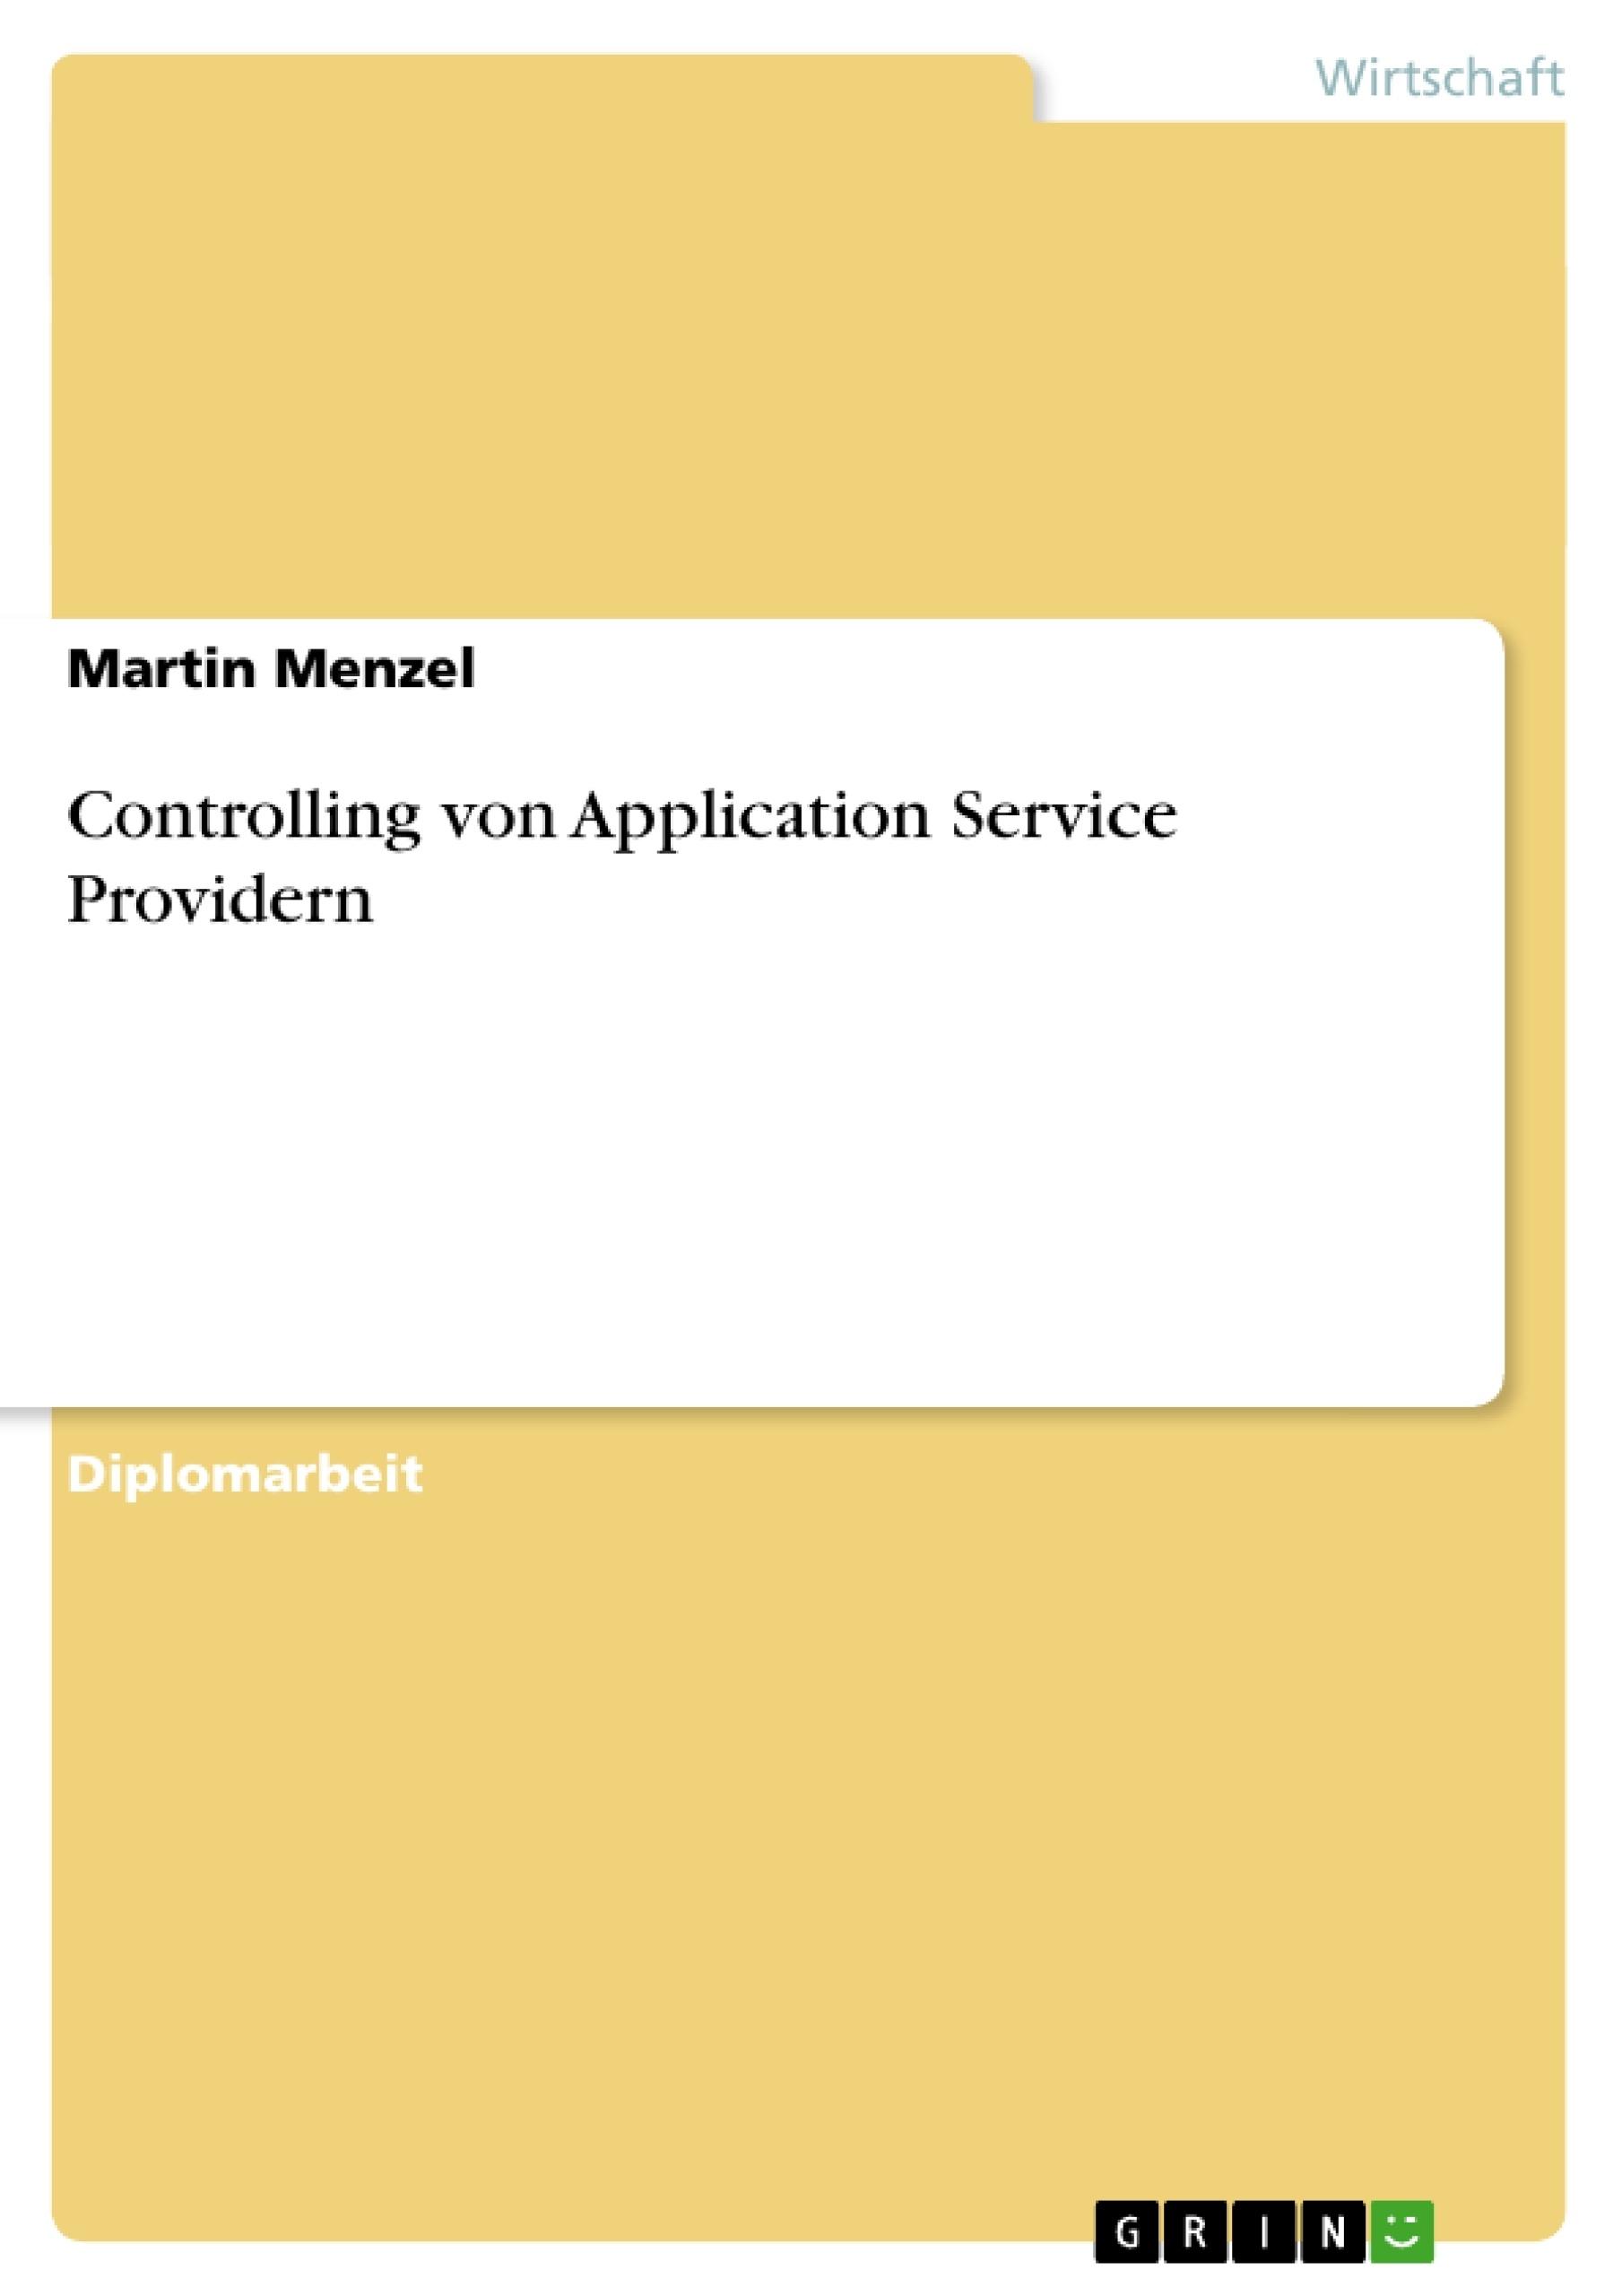 Titel: Controlling von Application Service Providern